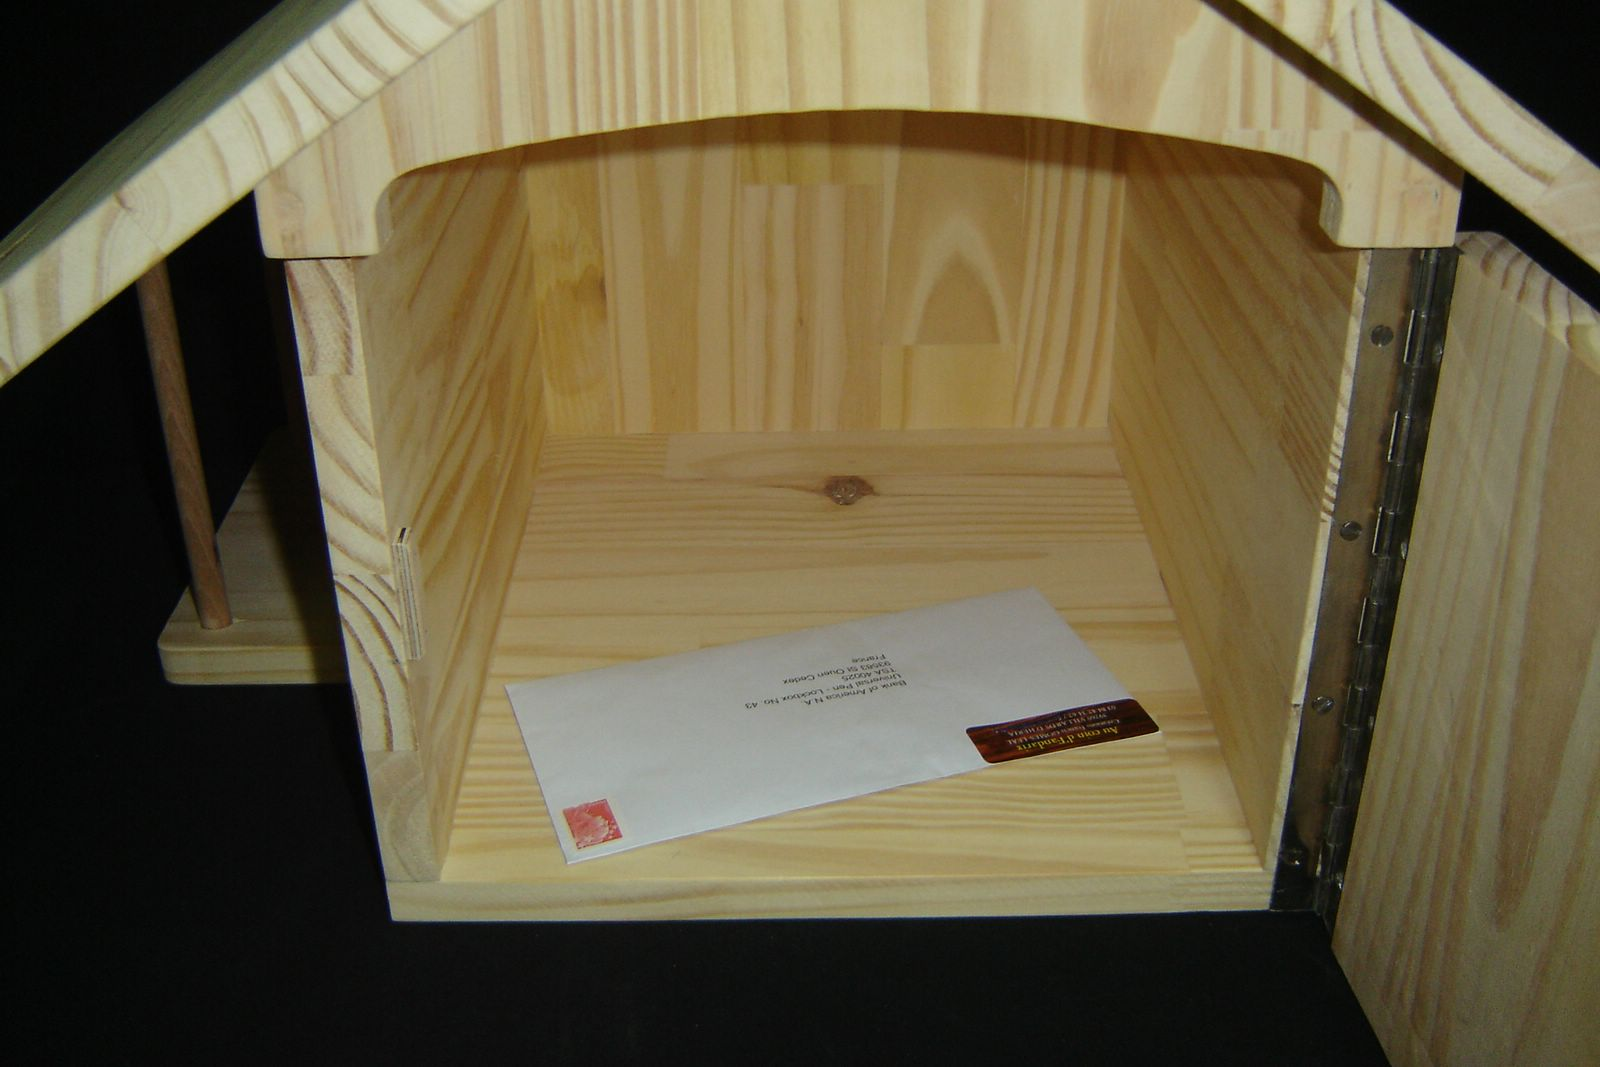 boite aux lettres en bois leroy merlin. Black Bedroom Furniture Sets. Home Design Ideas